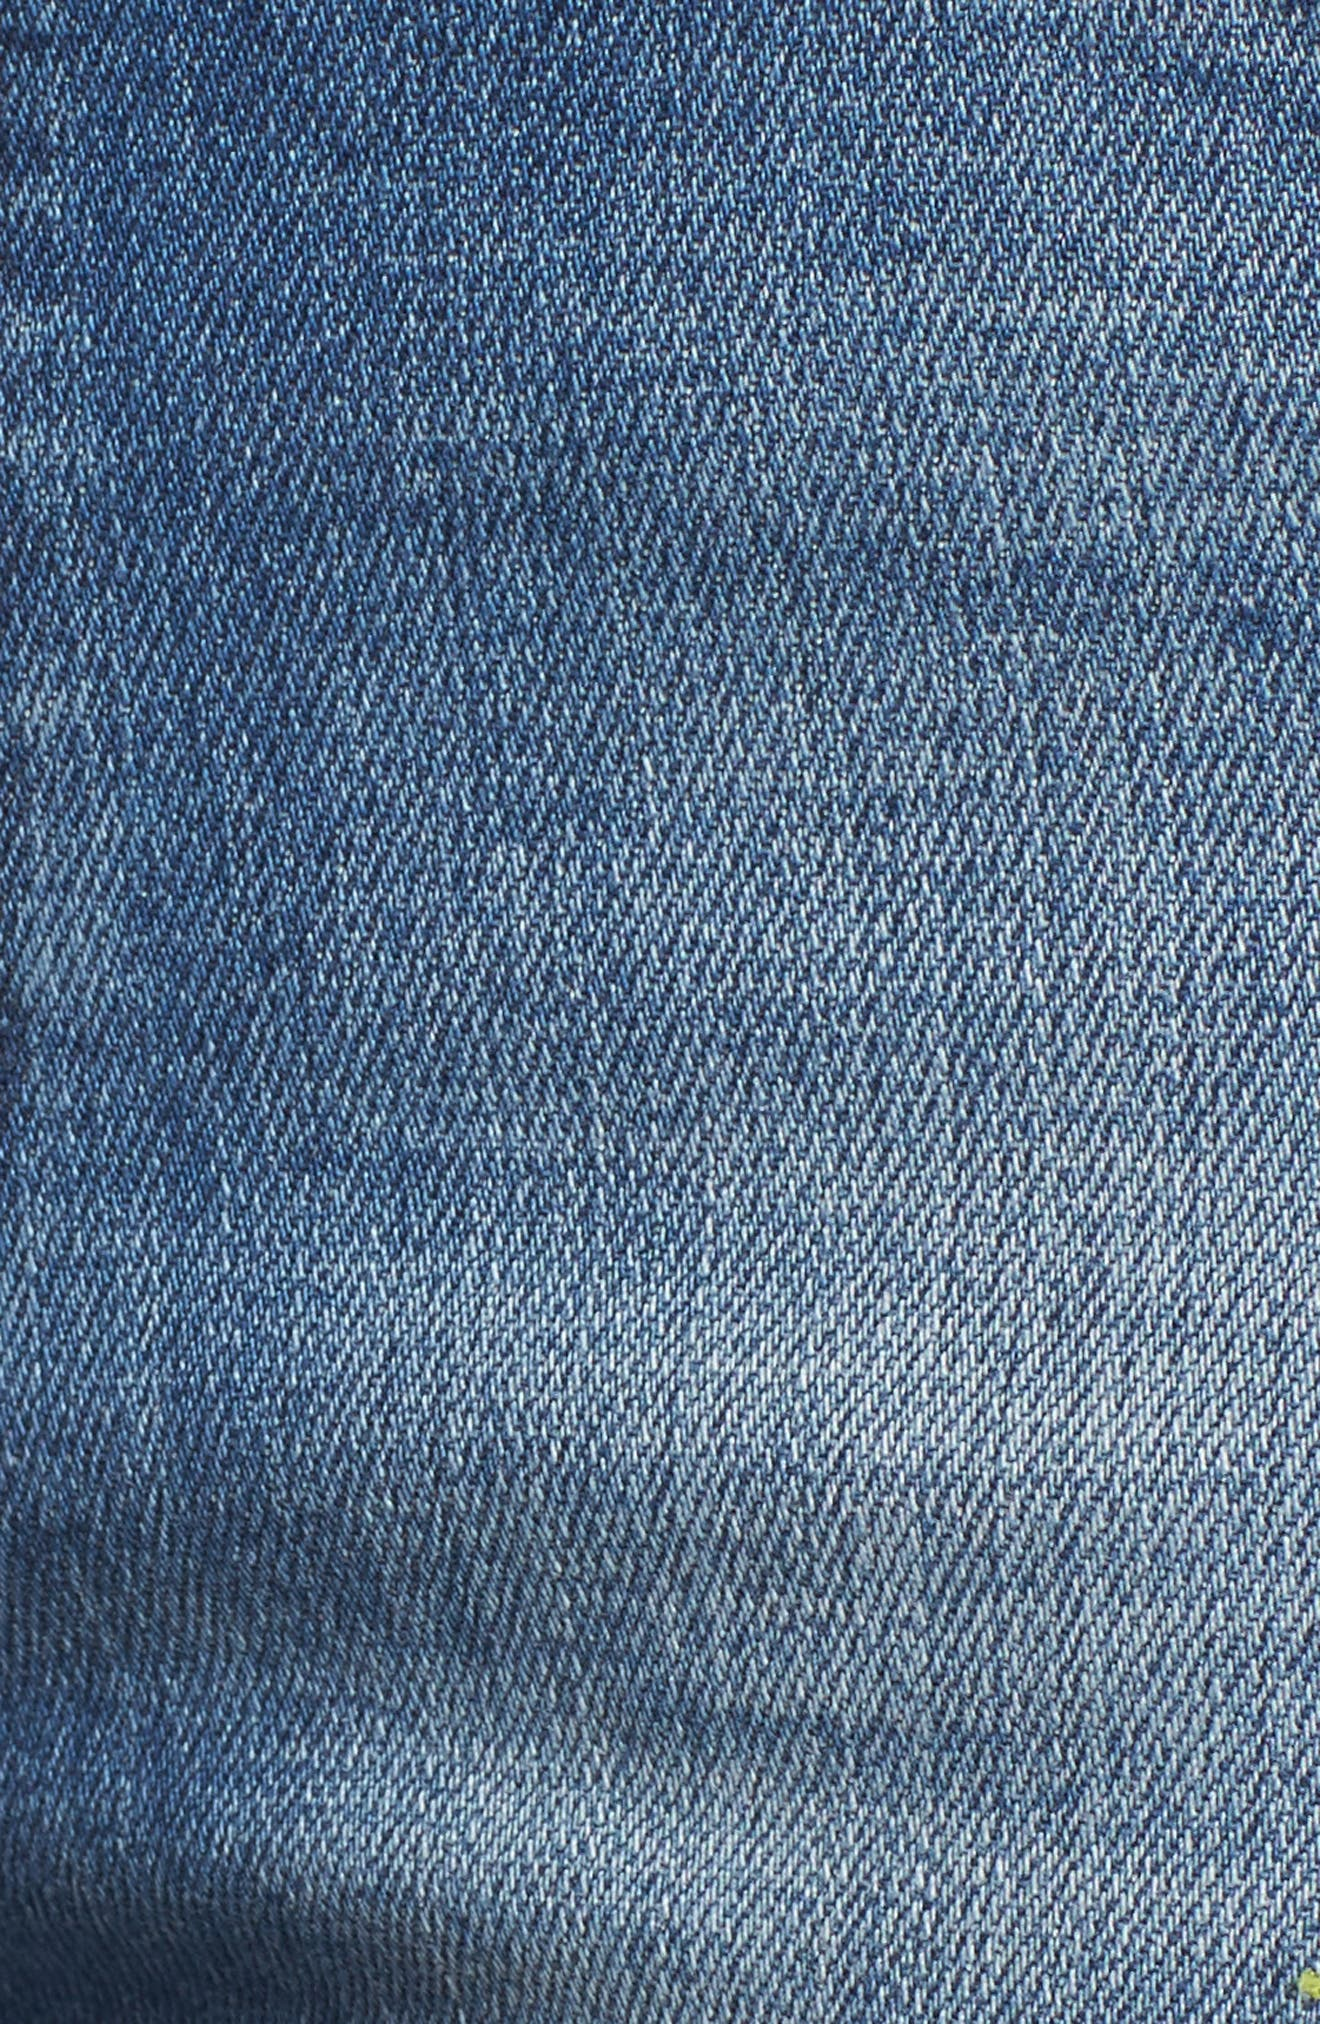 Paradise High Waist Skinny Jeans,                             Alternate thumbnail 6, color,                             Mid Blue